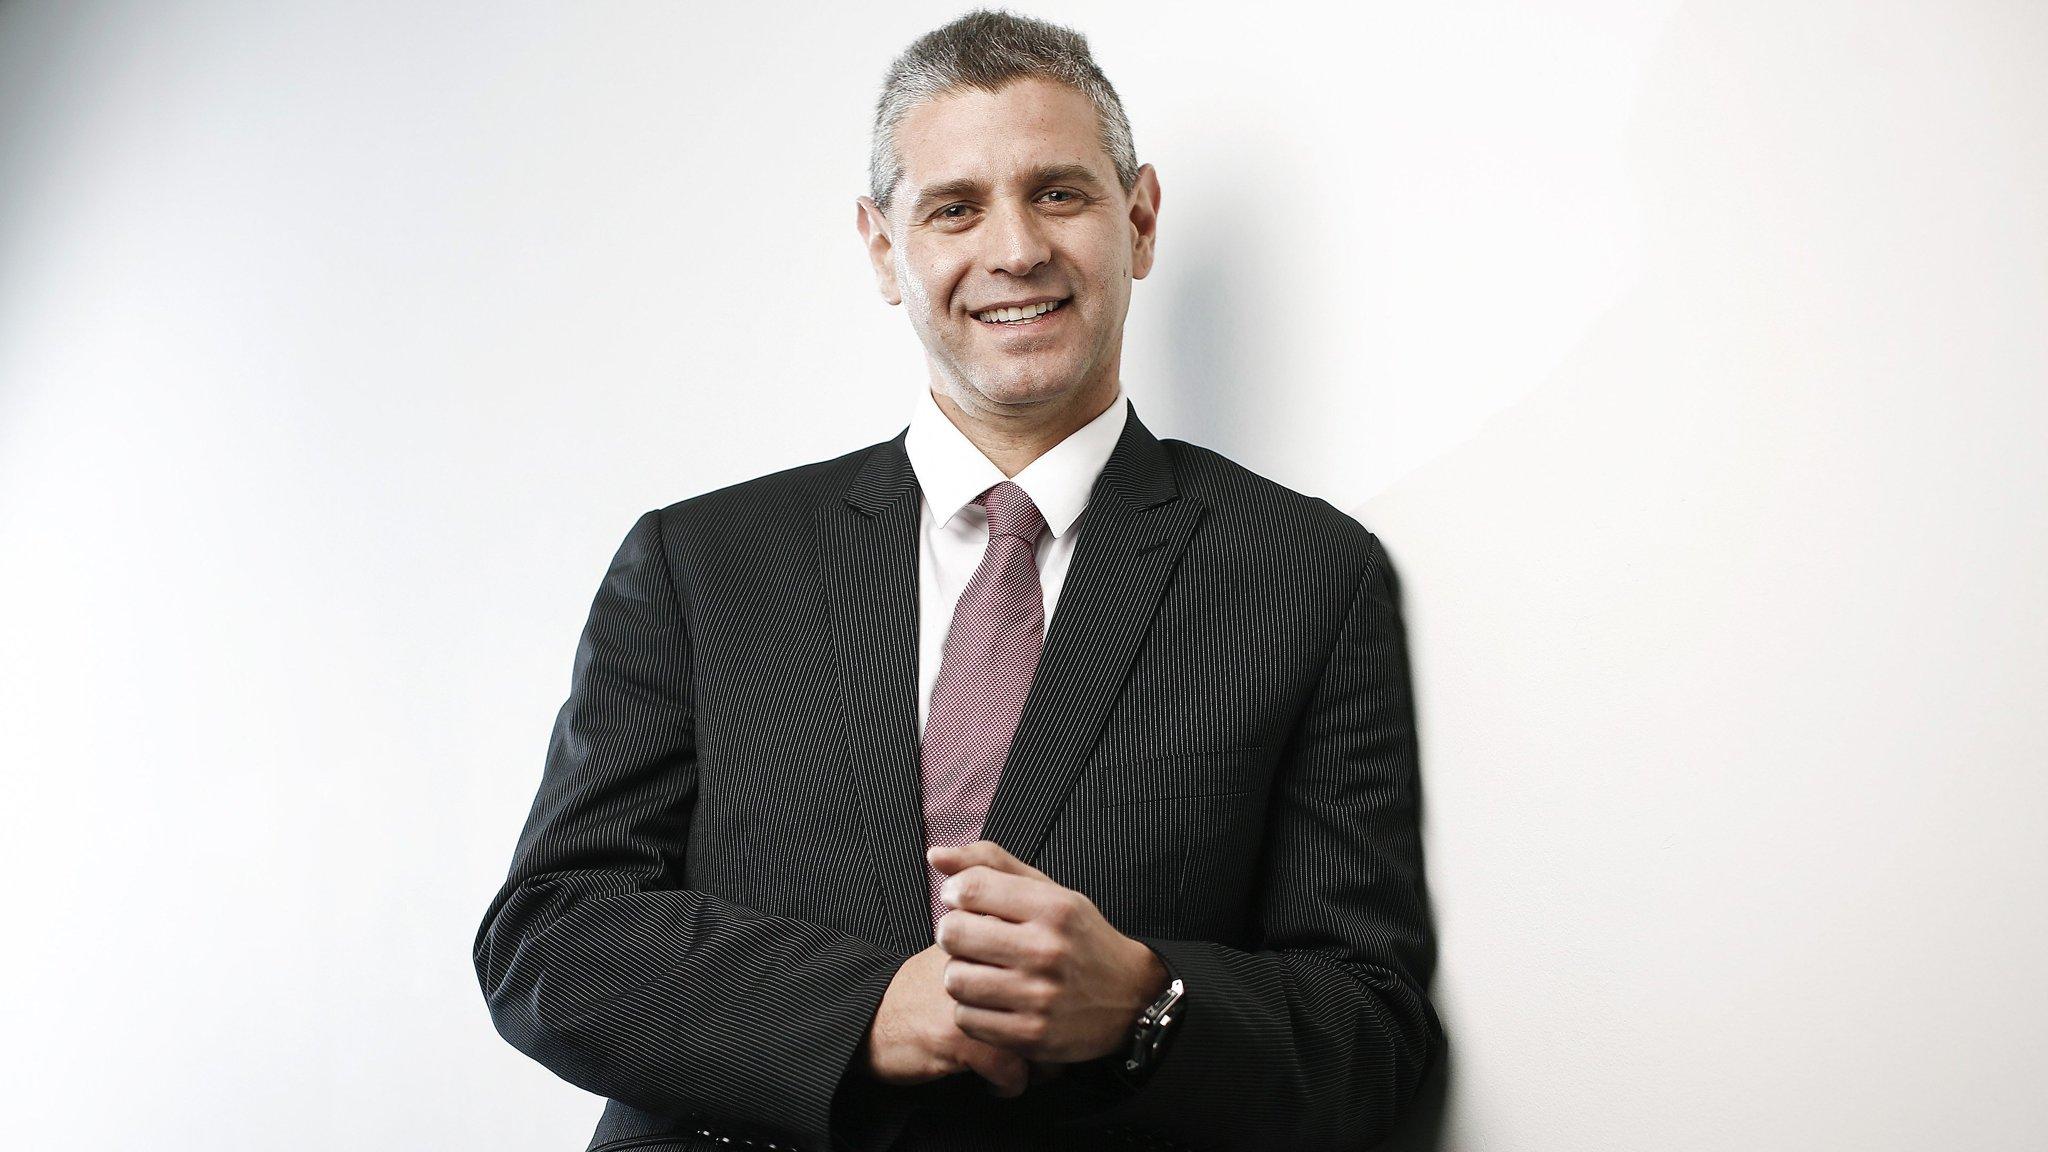 Mor Weizer, Playtech CEO